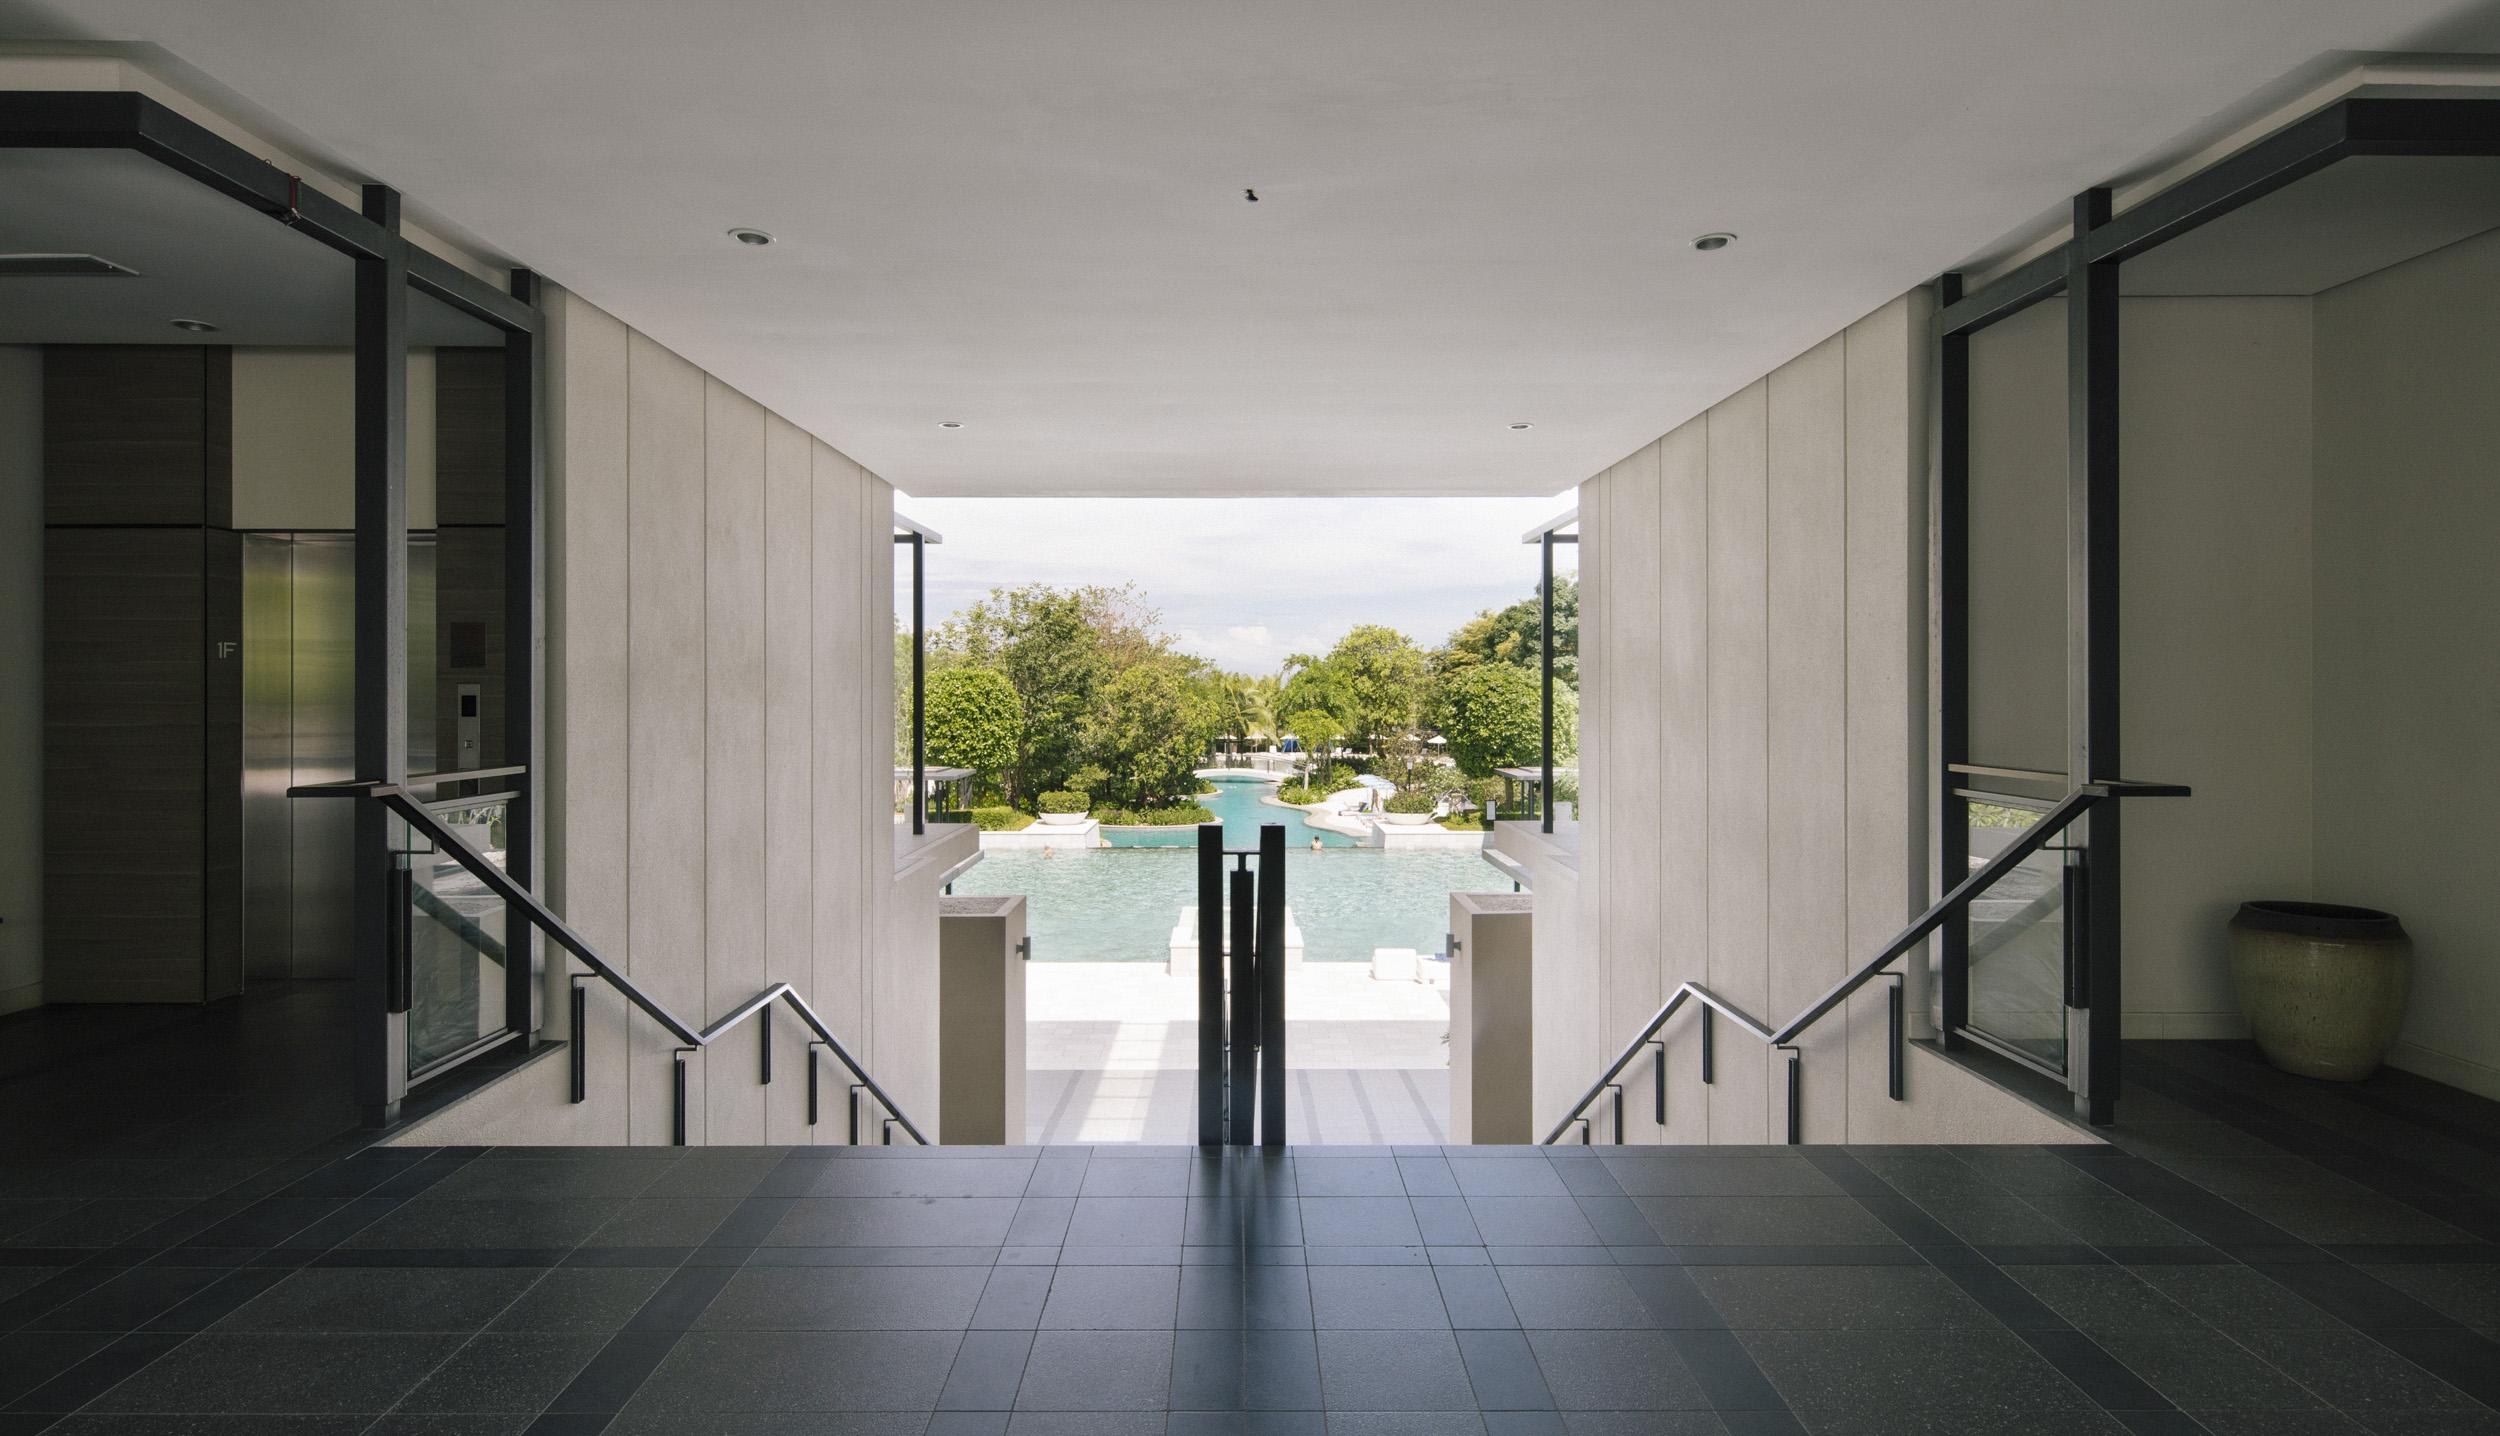 architecture_photography_sydney_australia_41.jpg